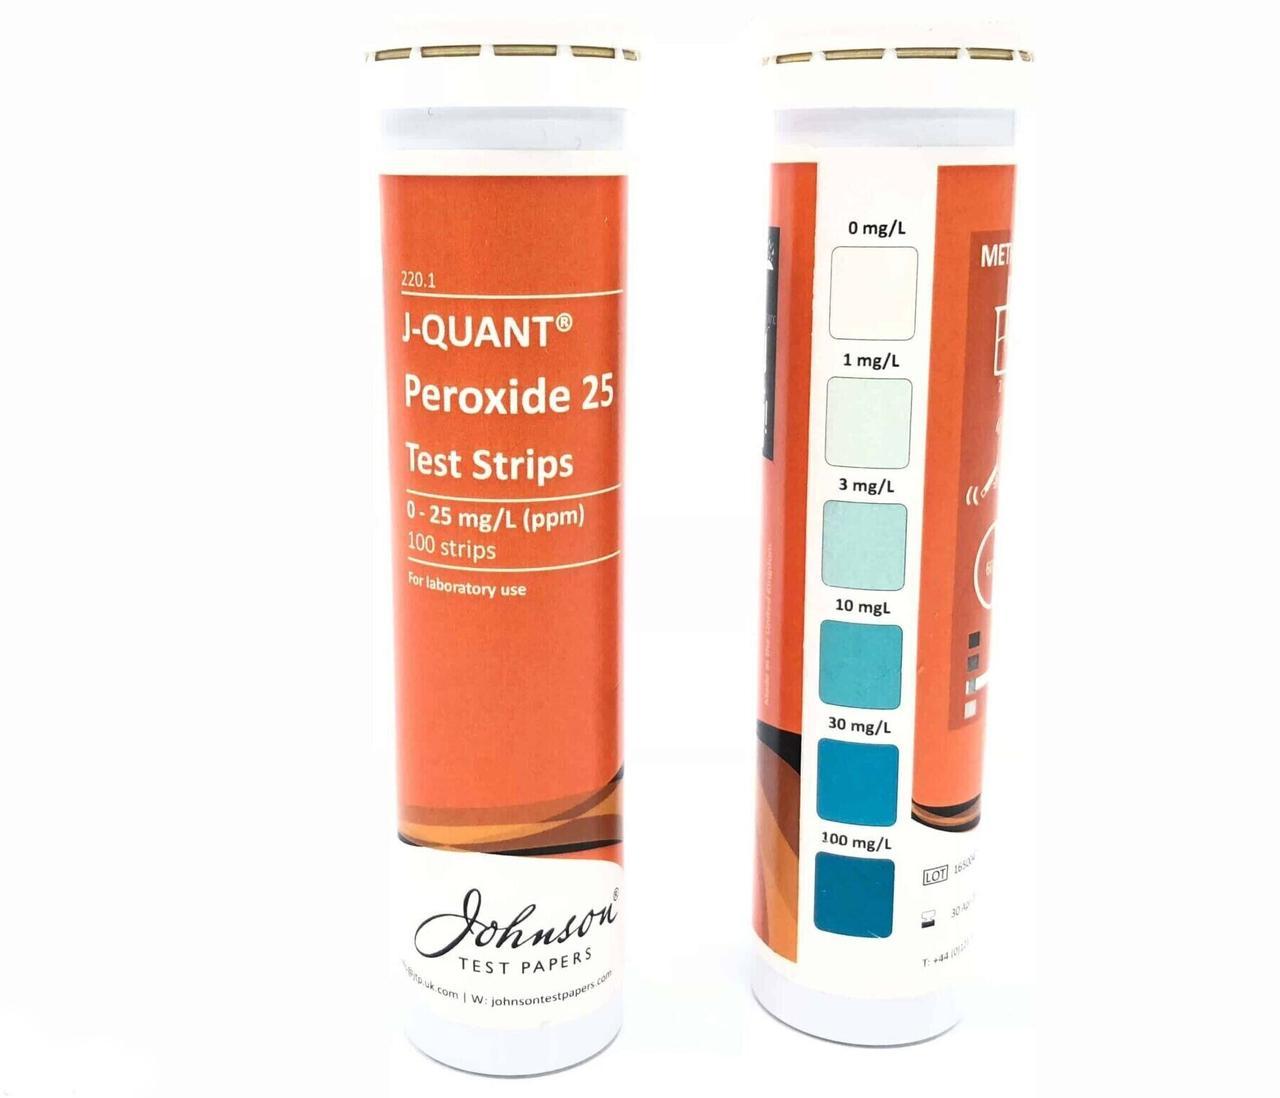 Тестові Смужки на пероксид до 25 ppm JTP J-QUANT Peroxide 25 (100 шт)